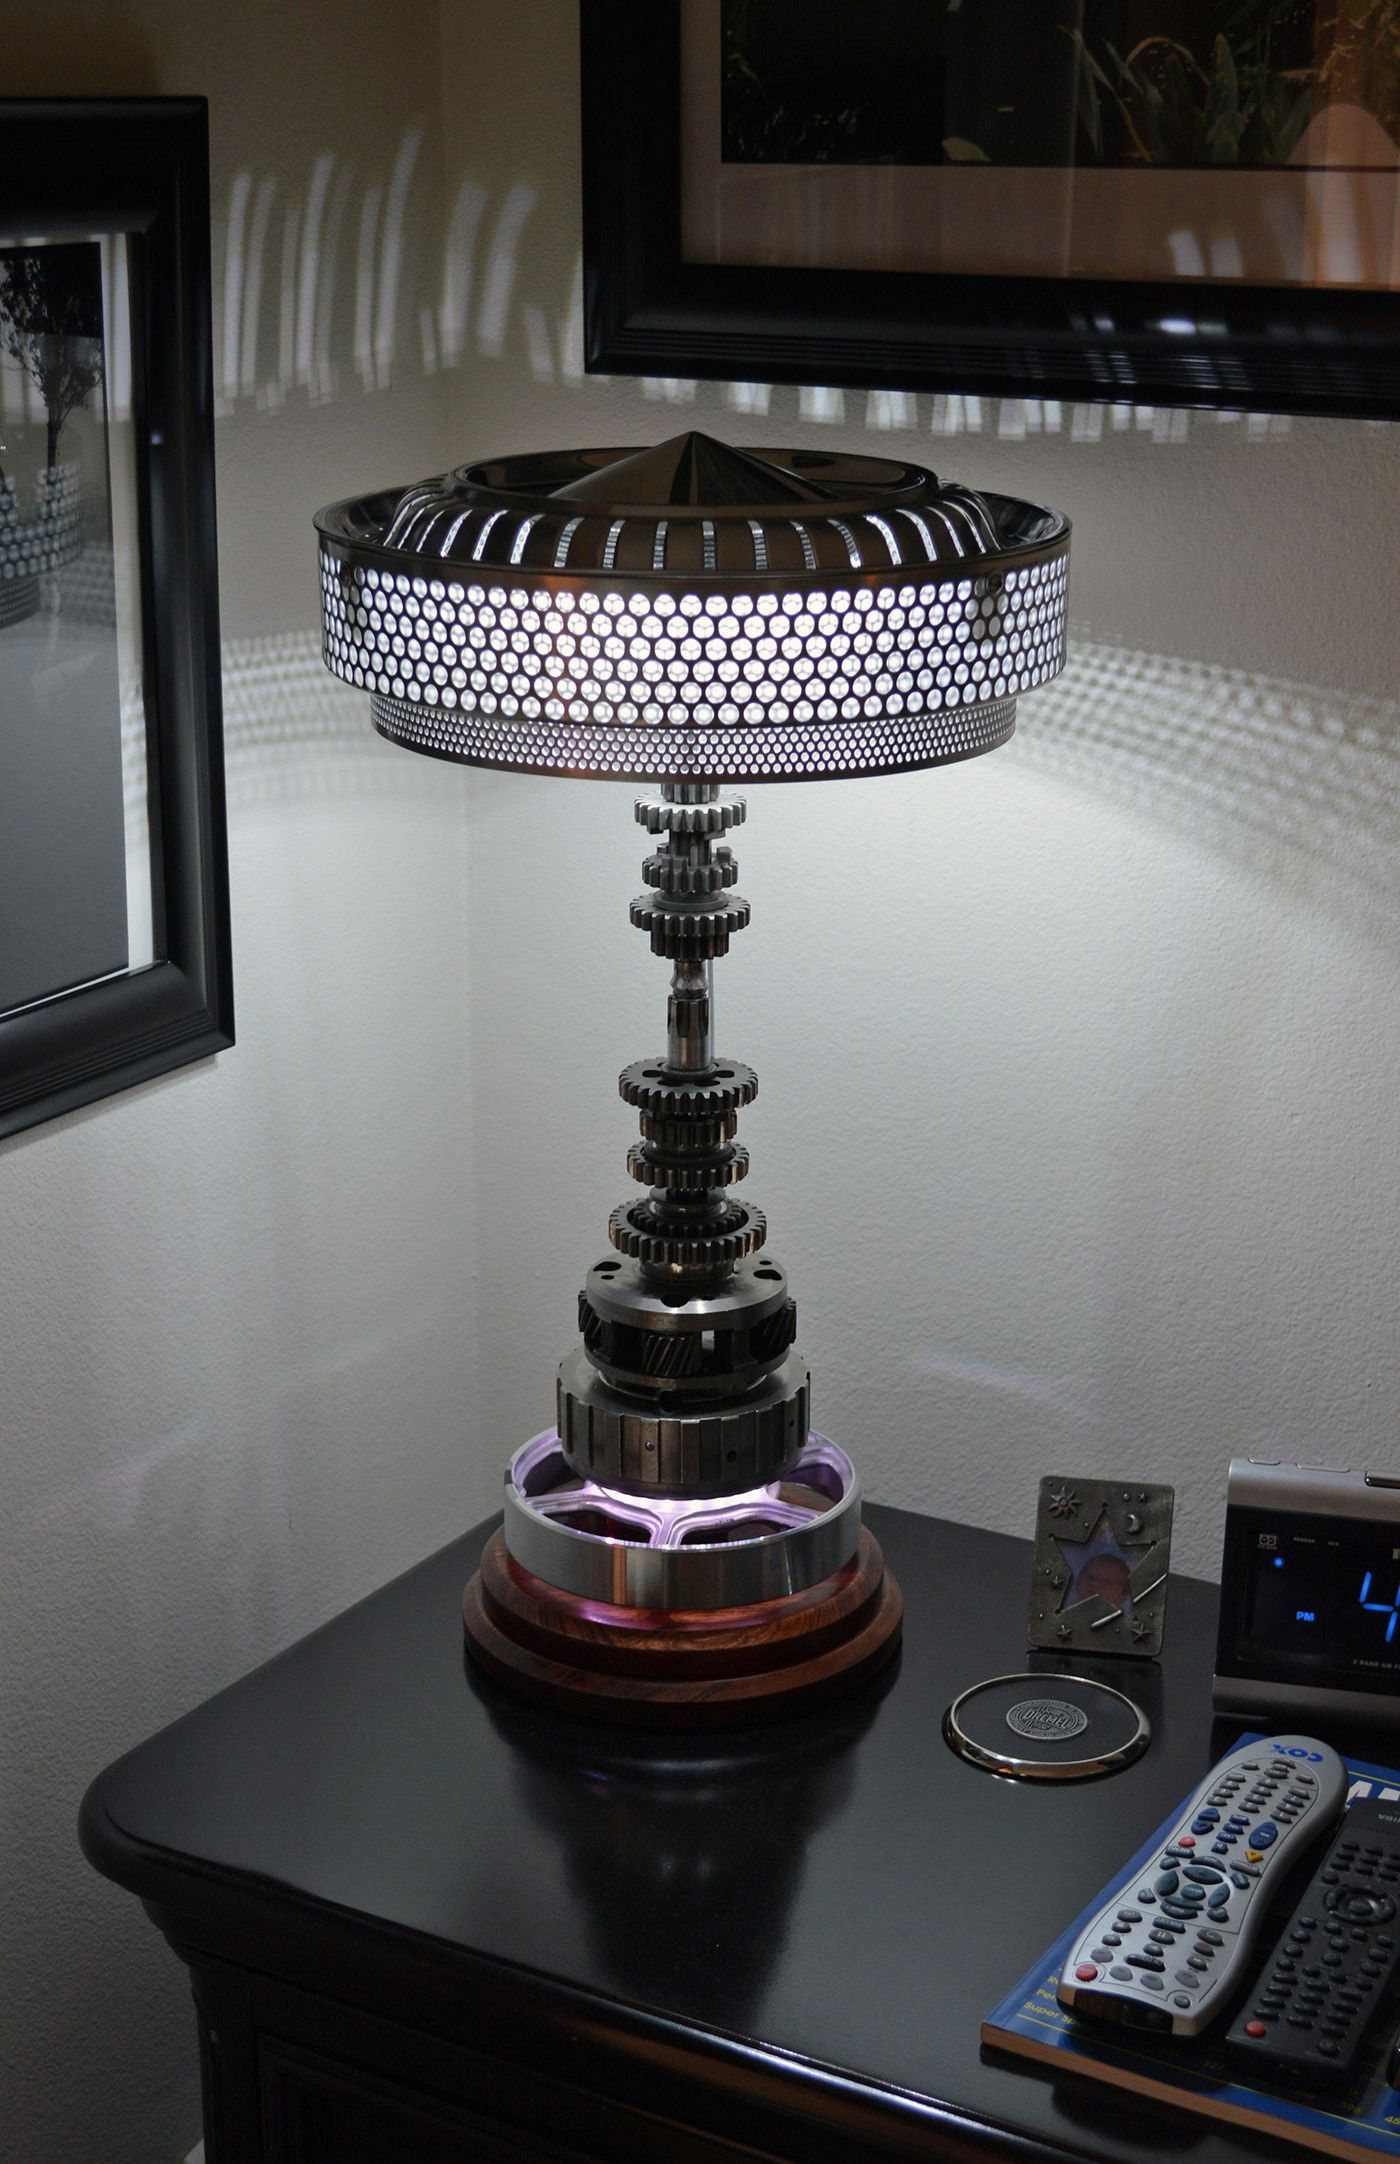 25 unique motorcycle air filters ideas on pinterest air - Car exterior decoration accessories ...